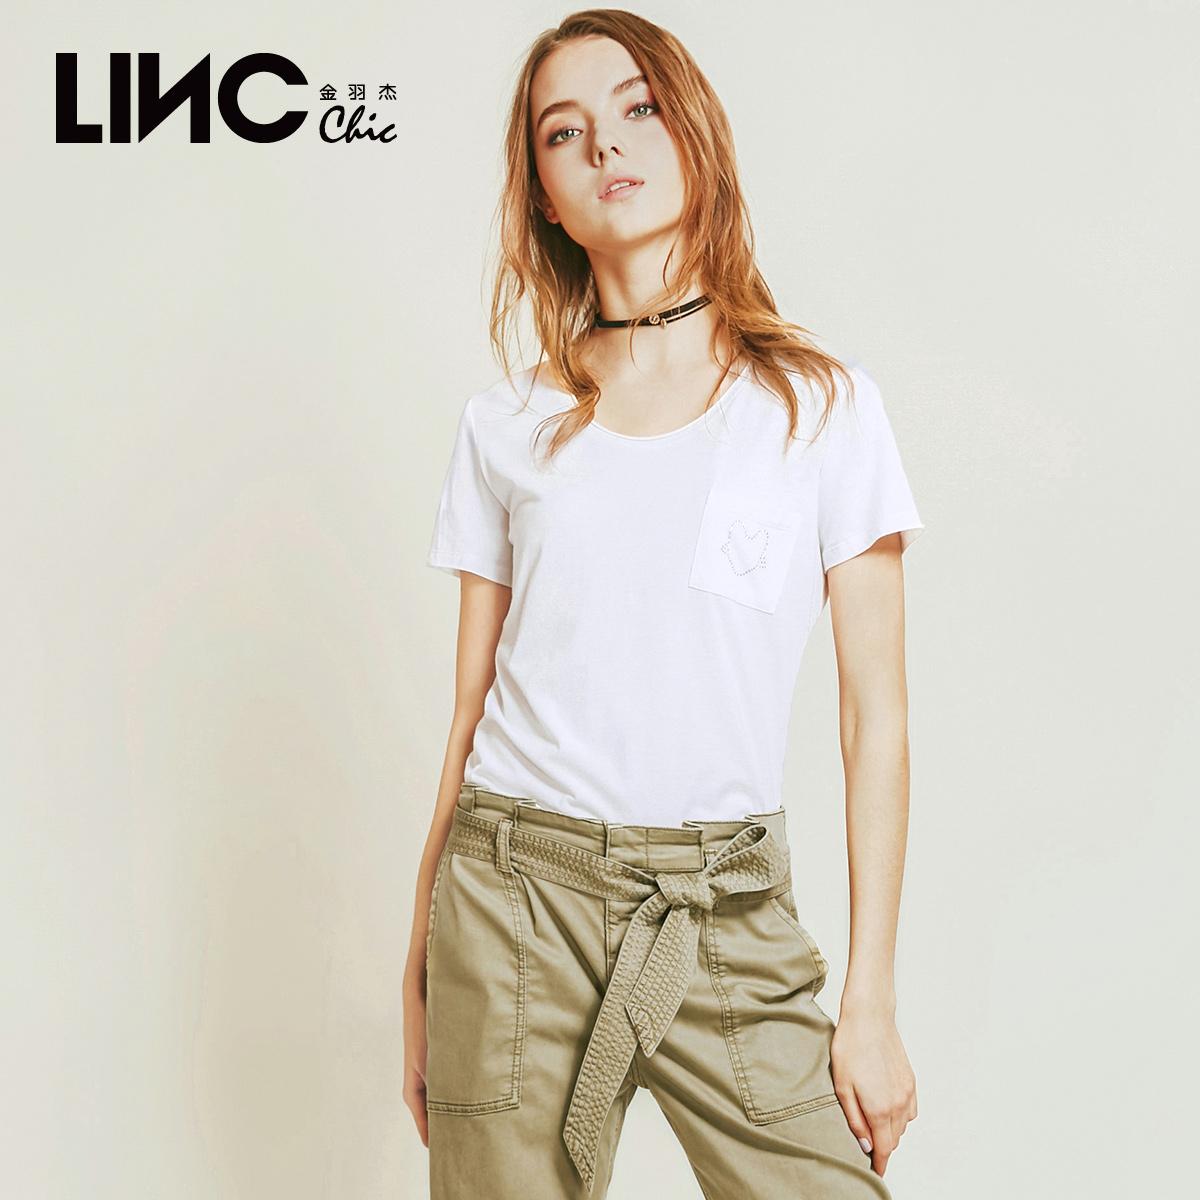 LINC金羽杰圆领白色网红纯棉短袖T恤女2020夏新款ins潮8231426